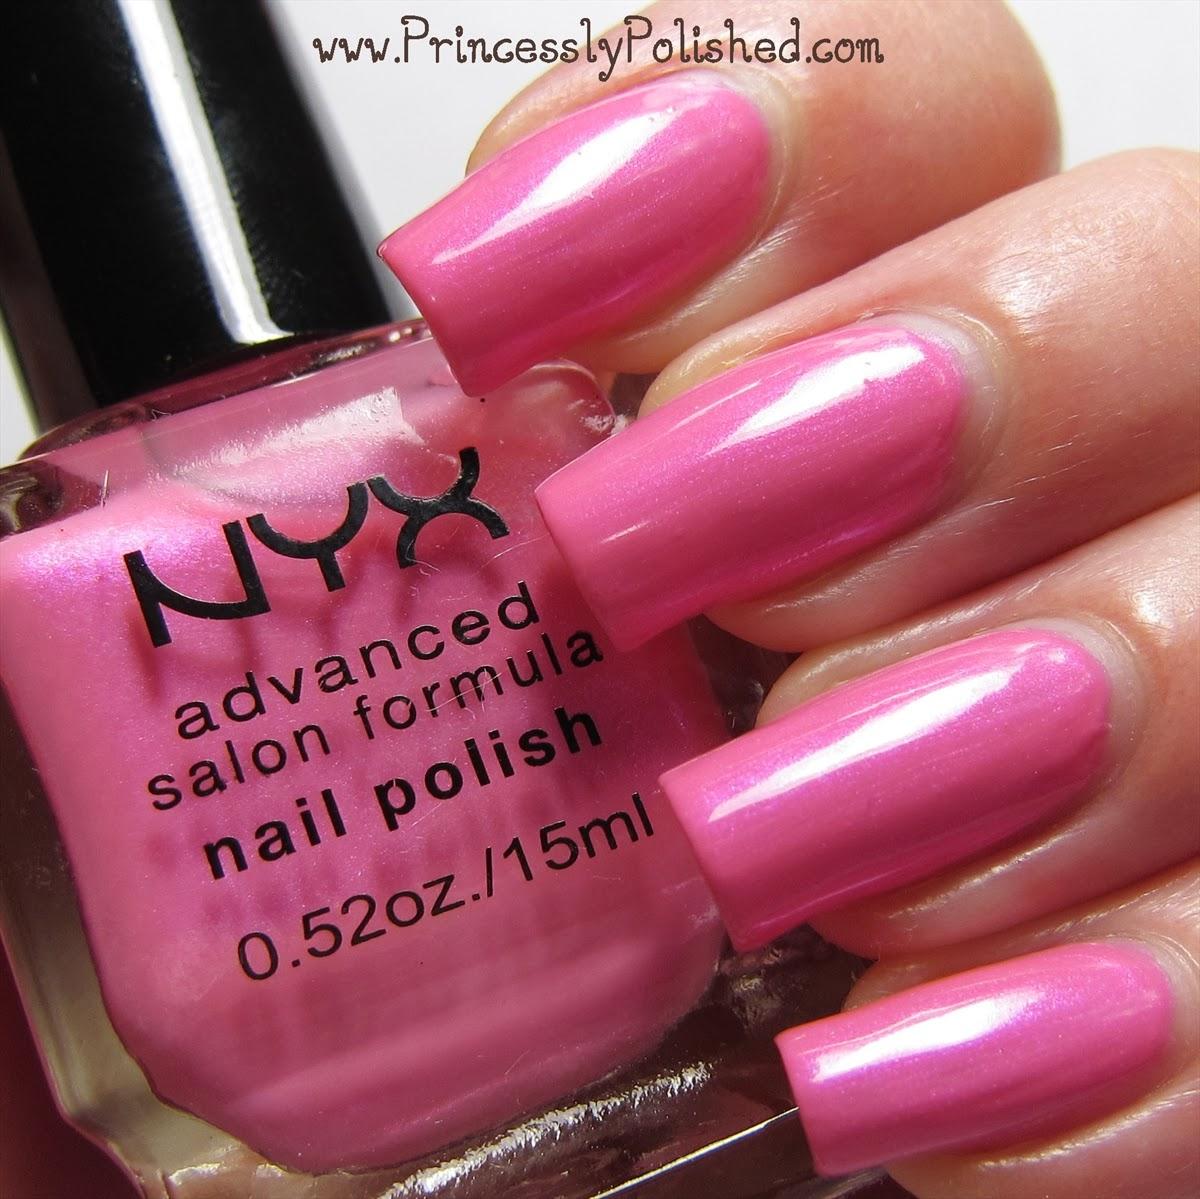 Princessly Polished: Nyx Advanced Salon Formula Nail